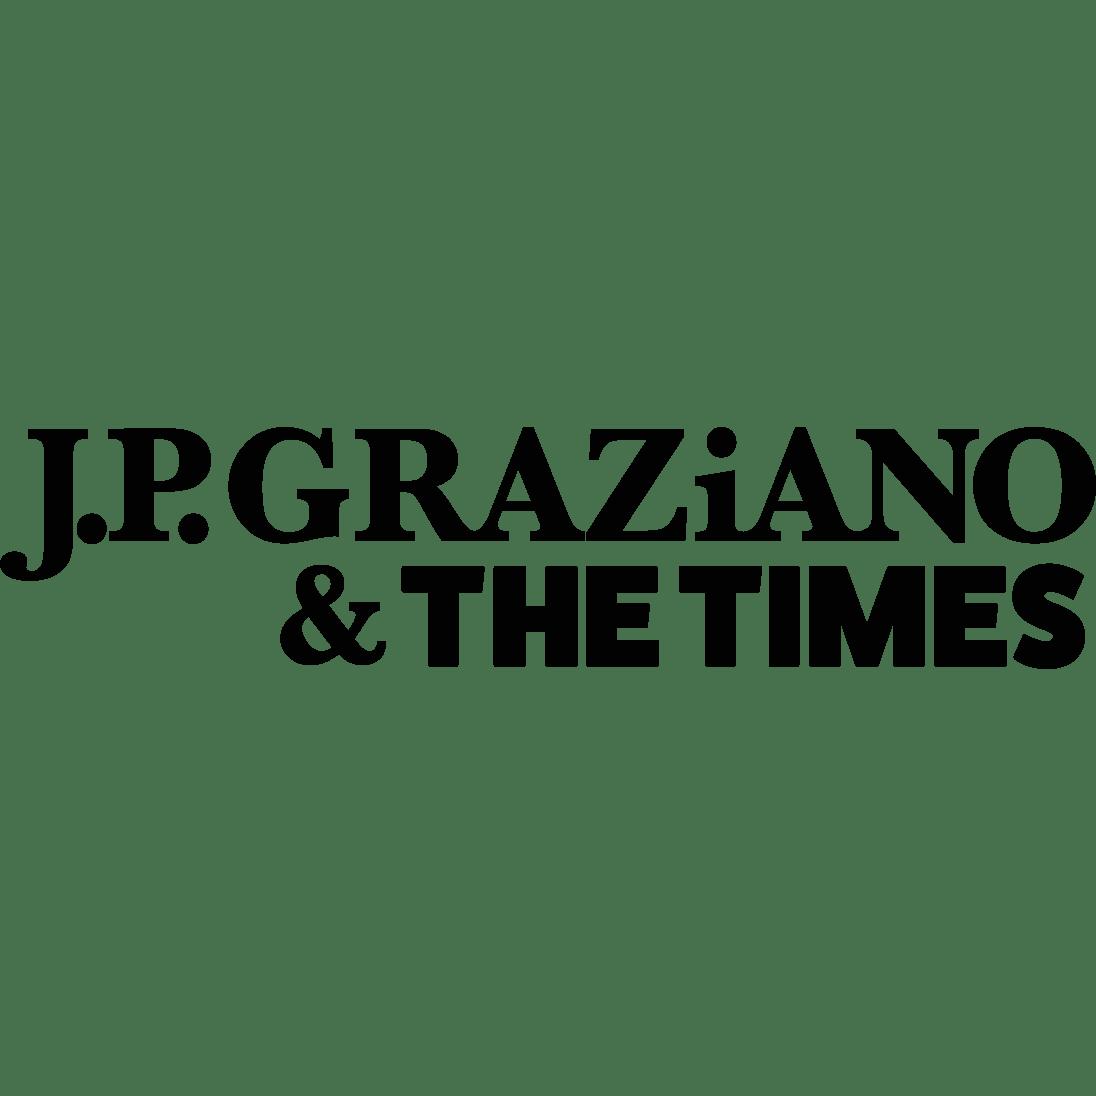 JP Graziano x The Times